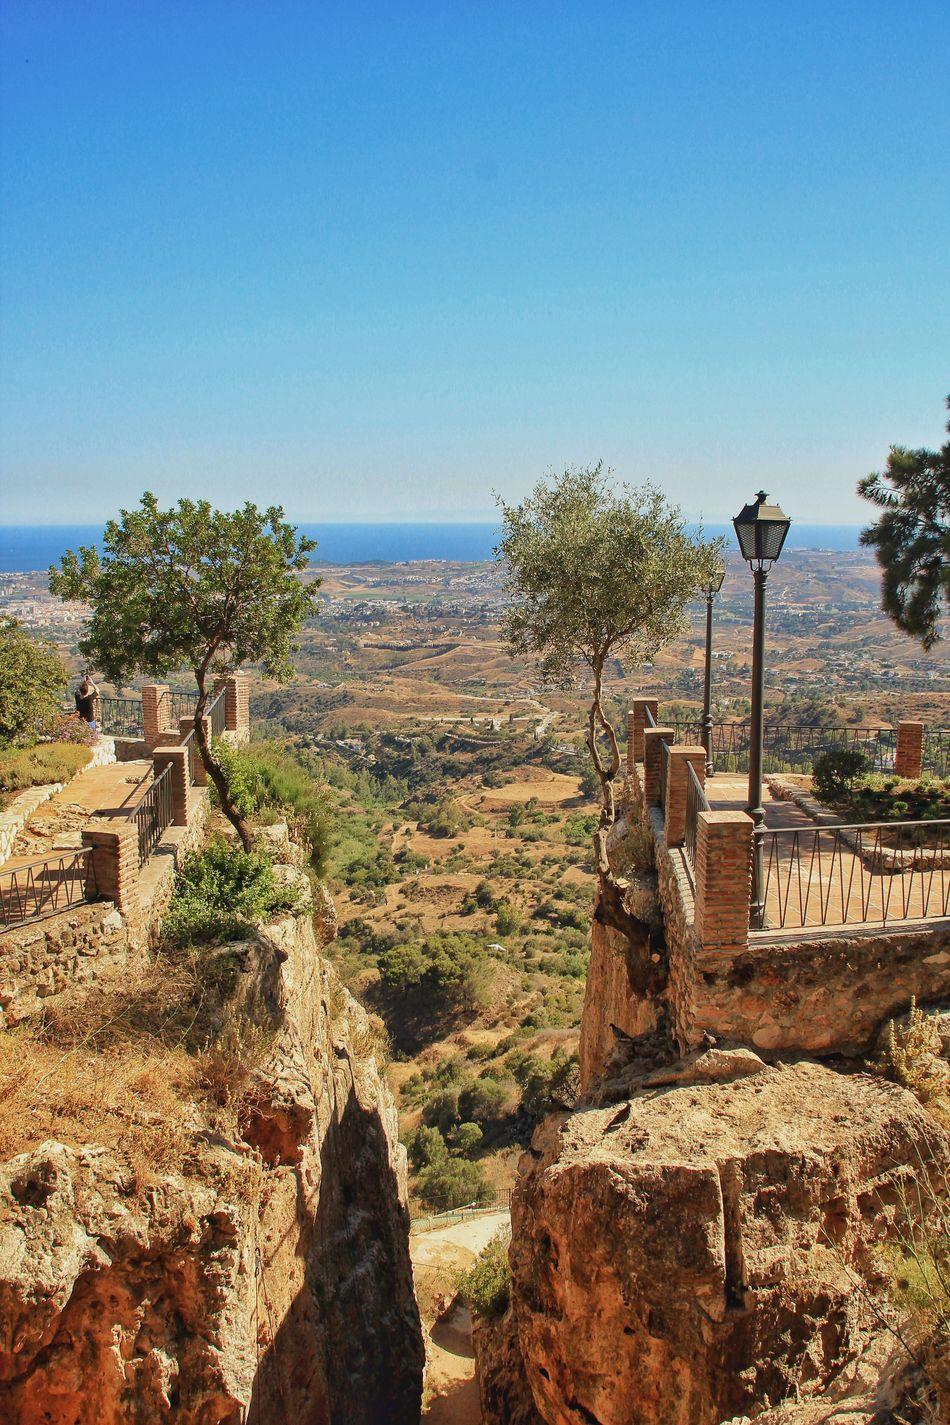 Mijas Mijasforever Pueblo Mijas Scenery Scenery Shots Sea And Sky Enjoying The View Amazing View Beautiful View